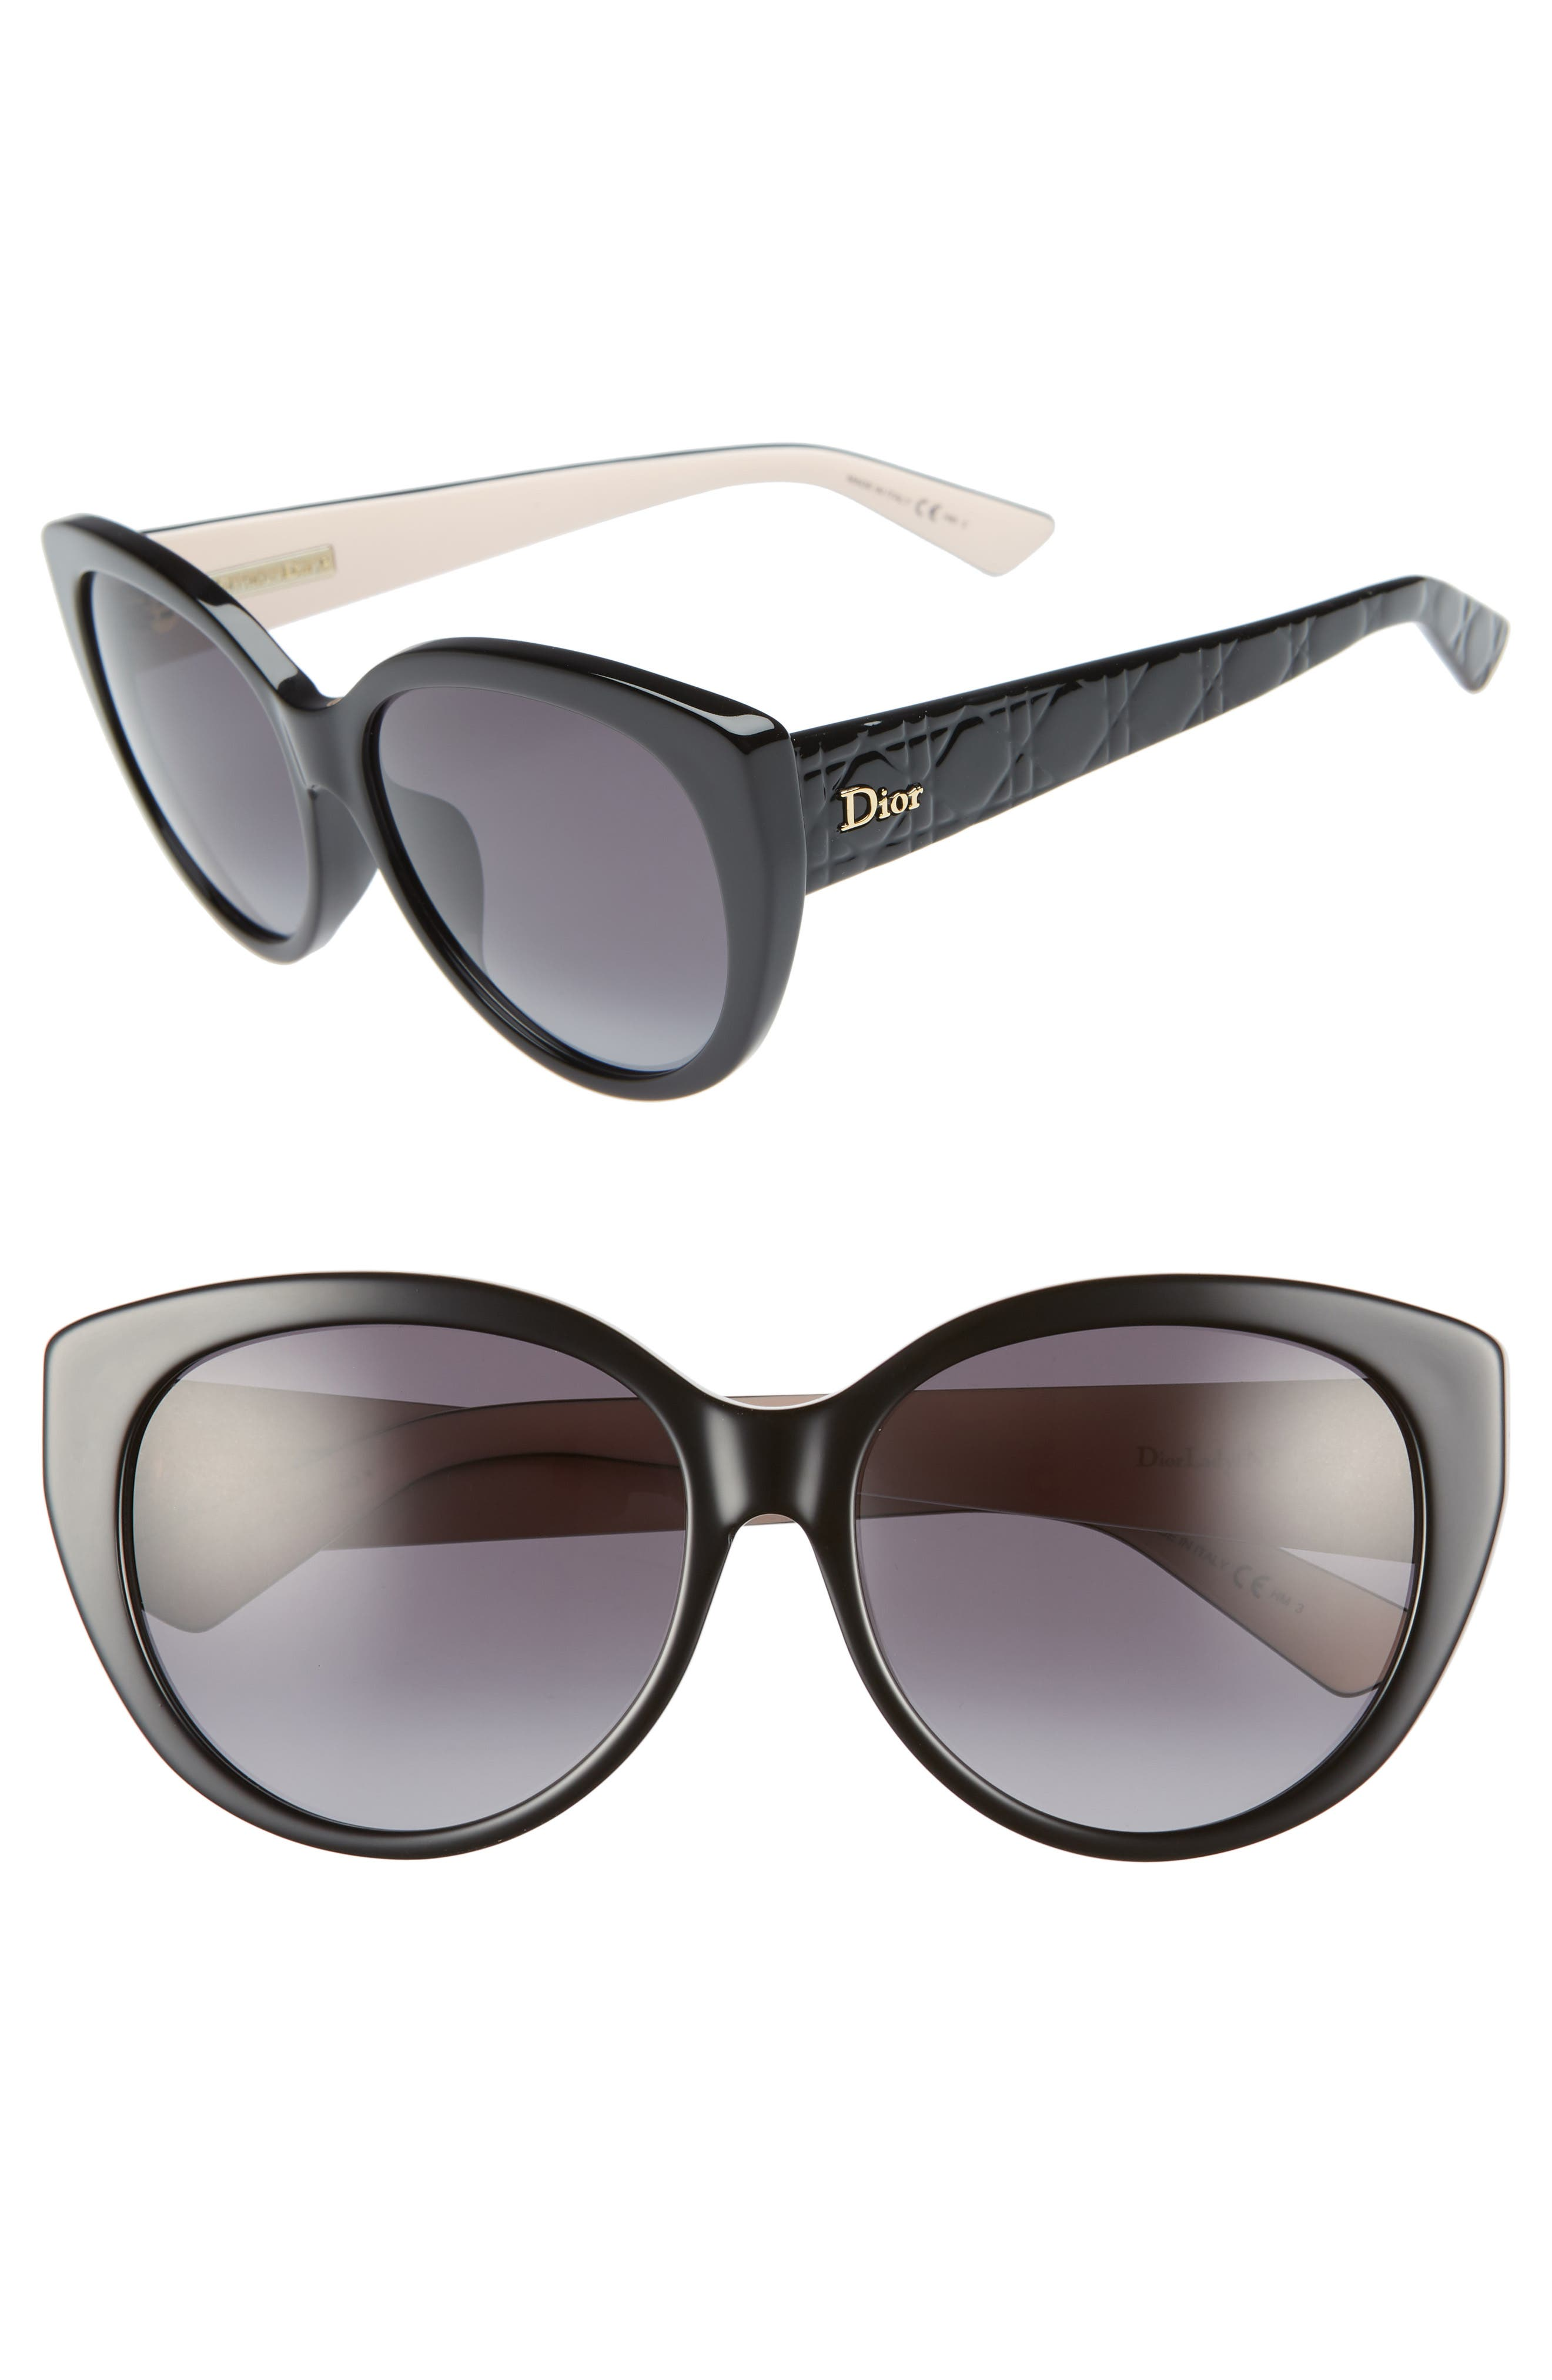 76c72b350598 Dior lady cat eye sunglasses black modesens jpg 780x1196 Cat dior